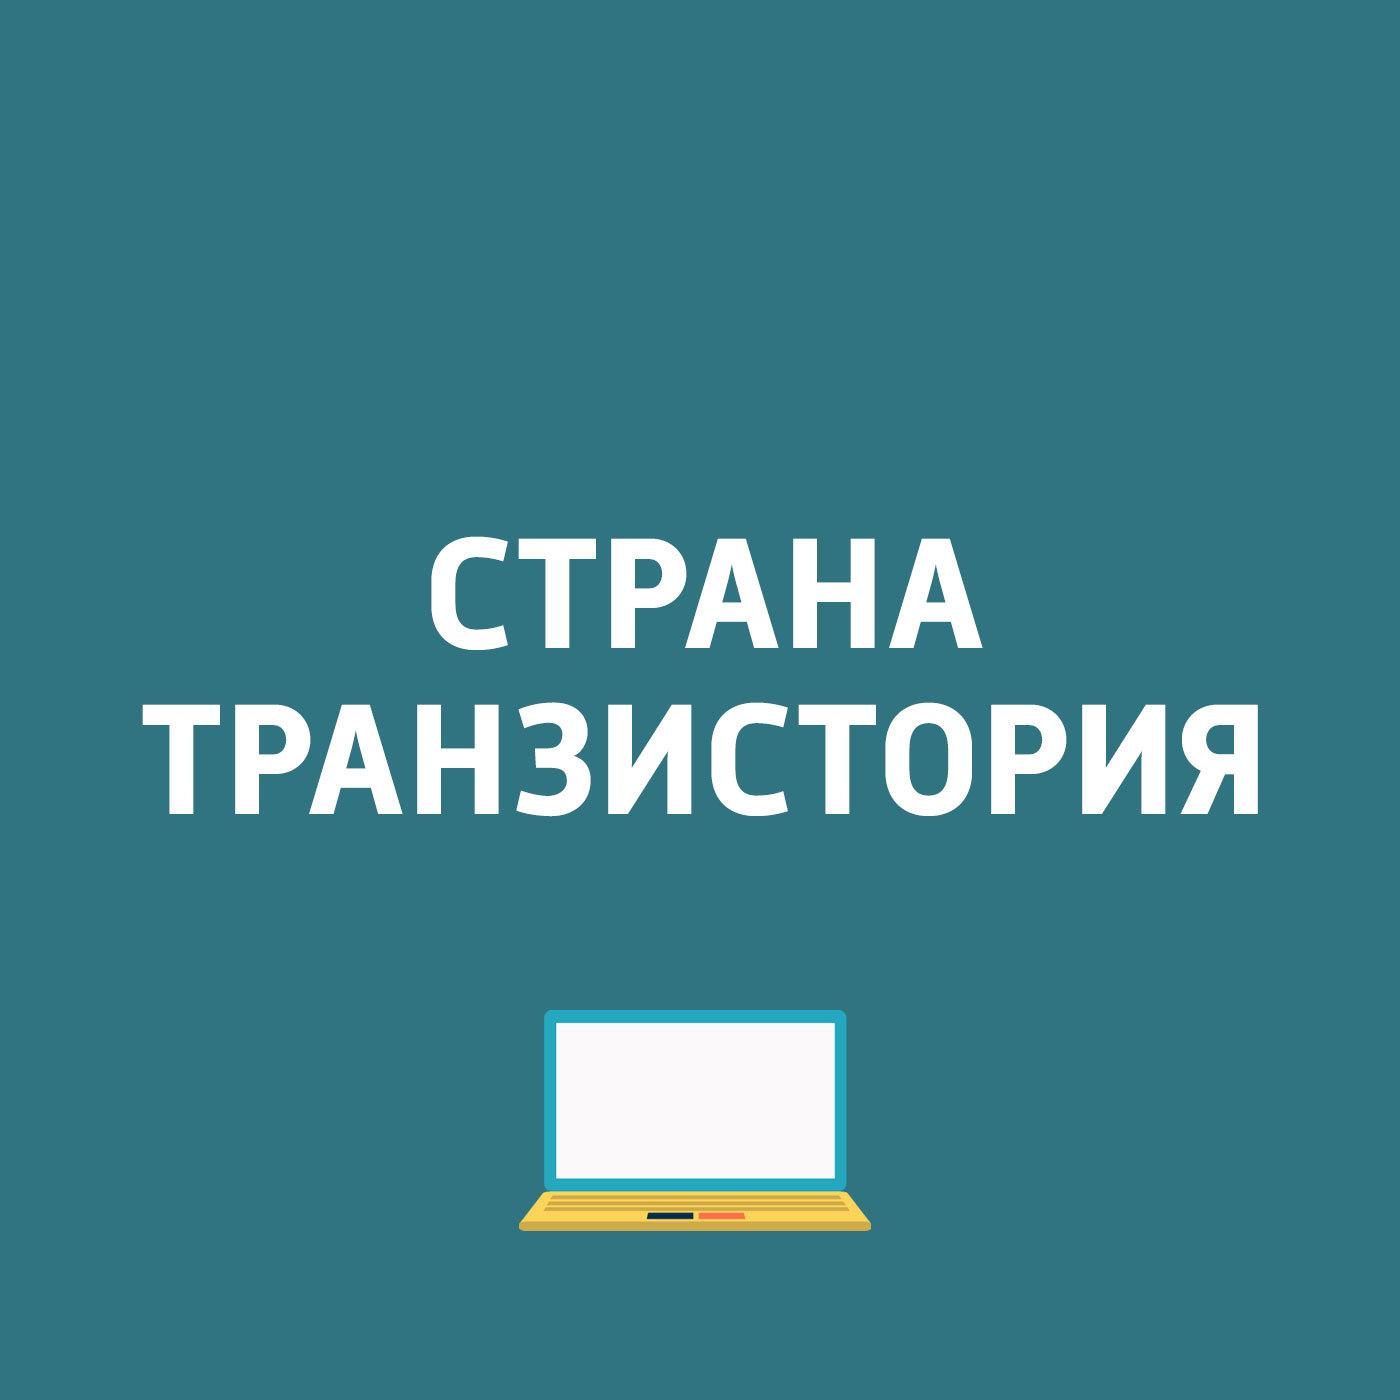 Картаев Павел LG X Venture; Garmin Virb 360... garmin virb